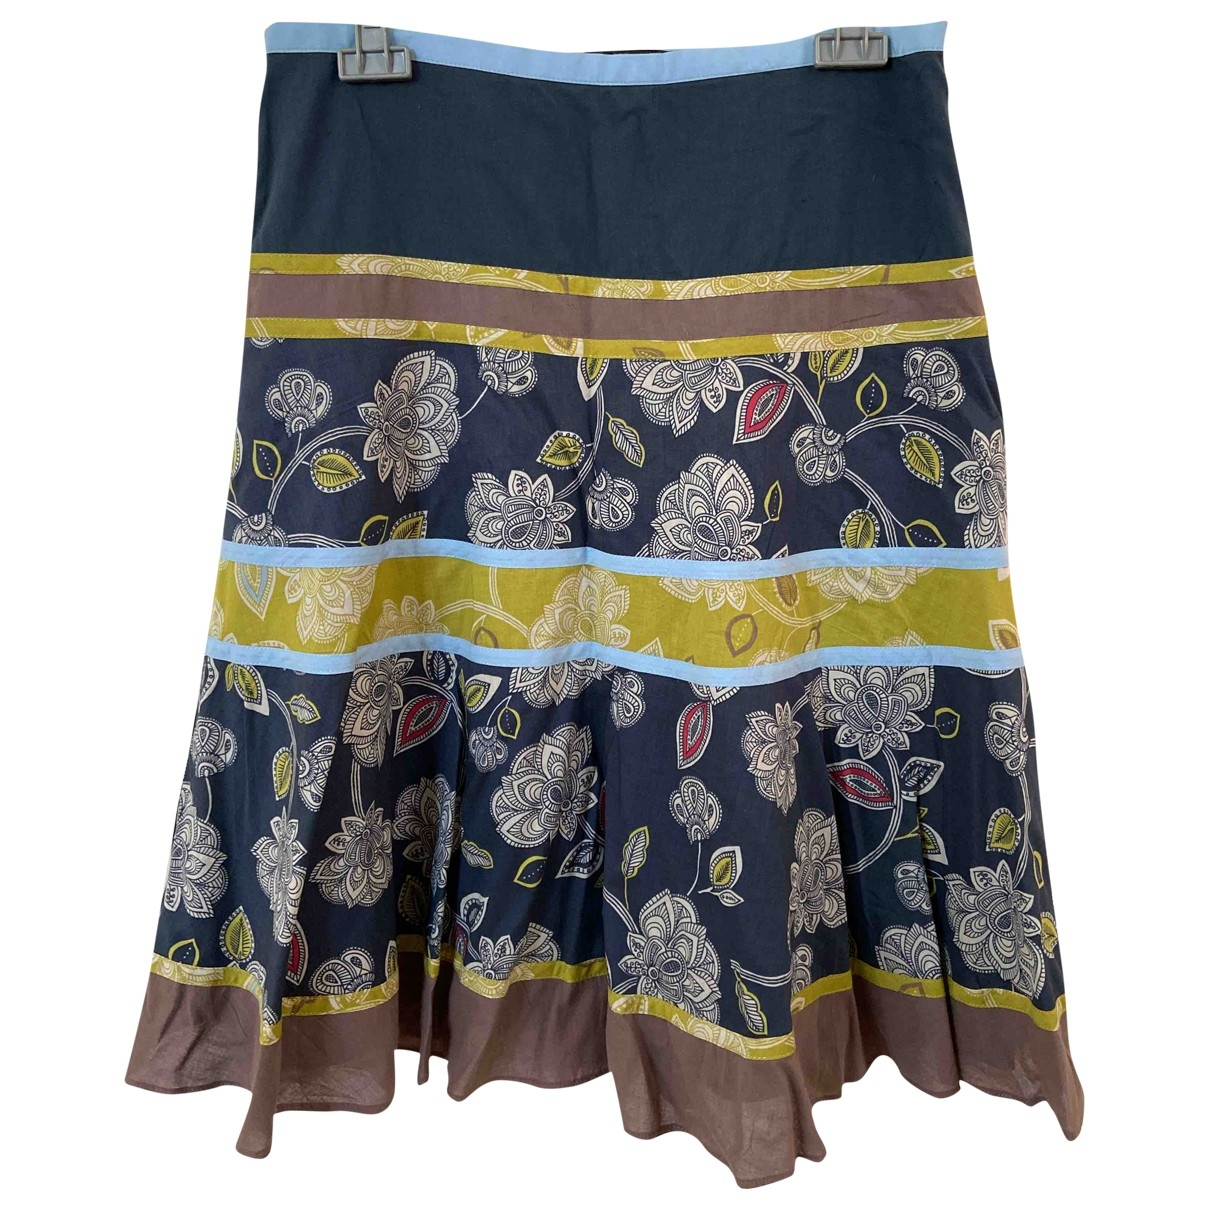 Bcbg Max Azria \N Multicolour Cotton skirt for Women One Size 0-5